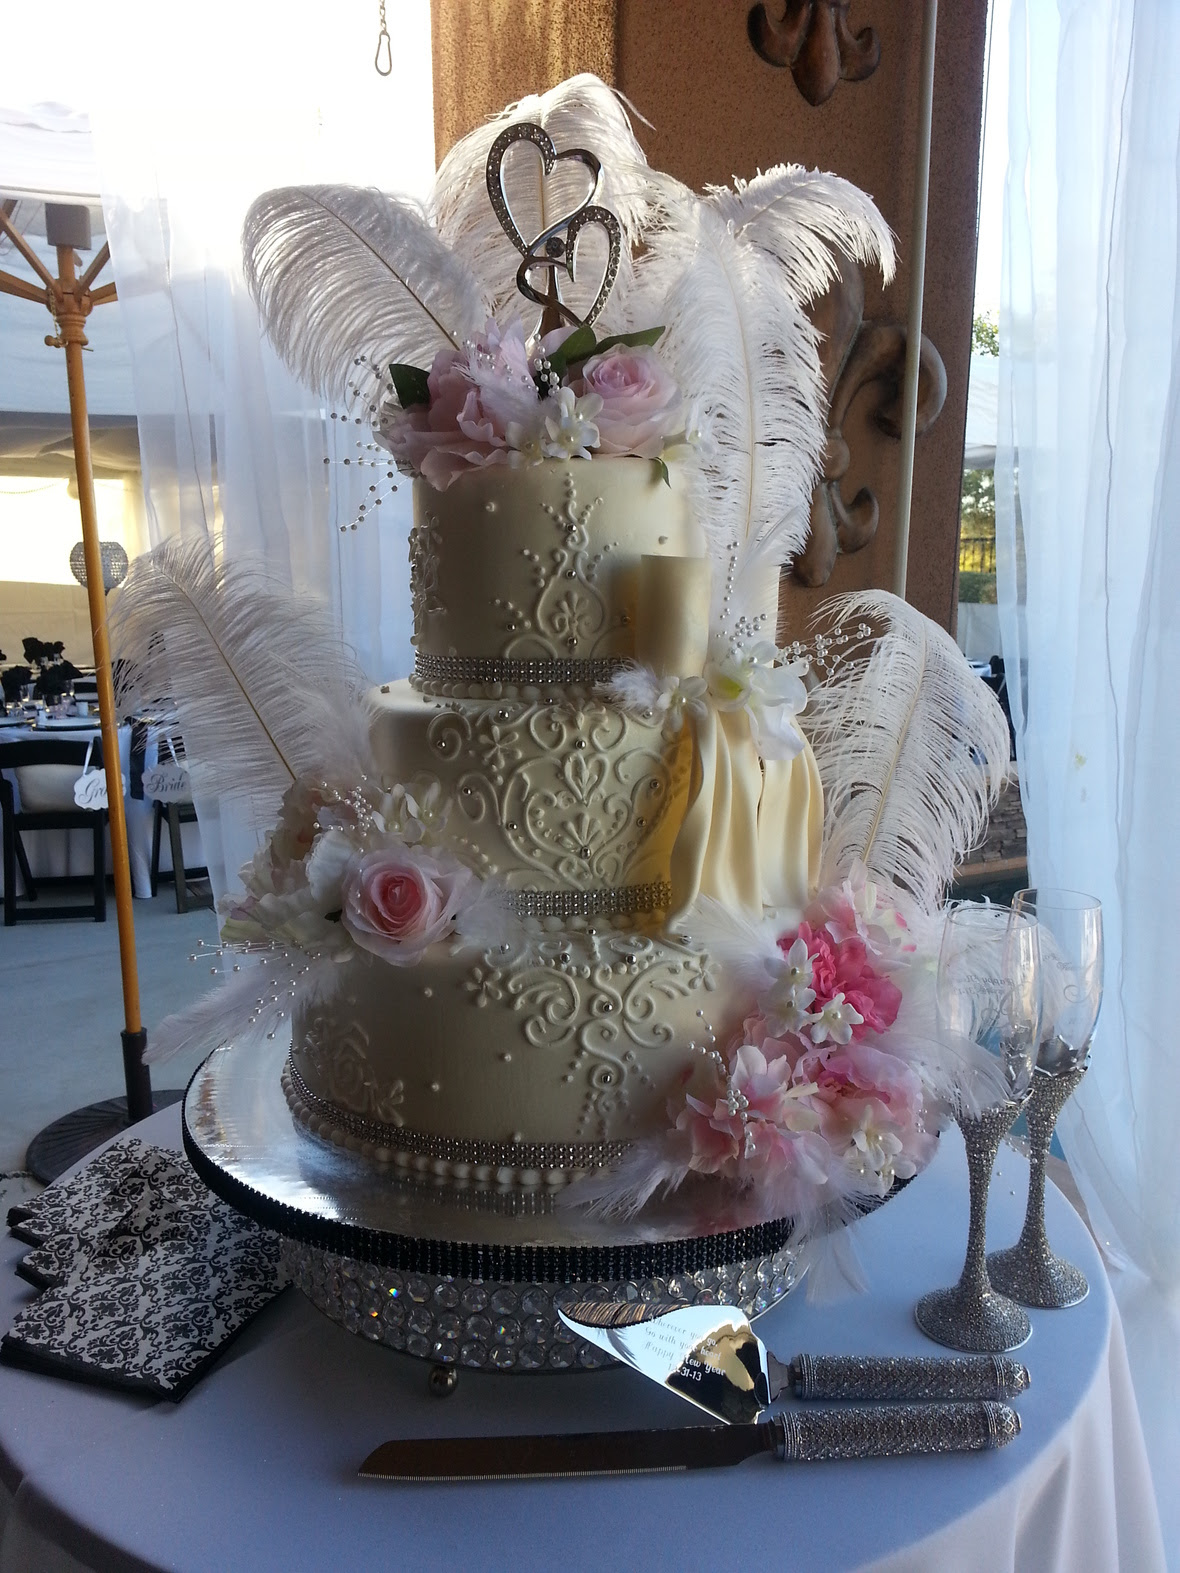 Bamboo Bakery 602 246 8061 Feb 7th 2019 Wedding Expo